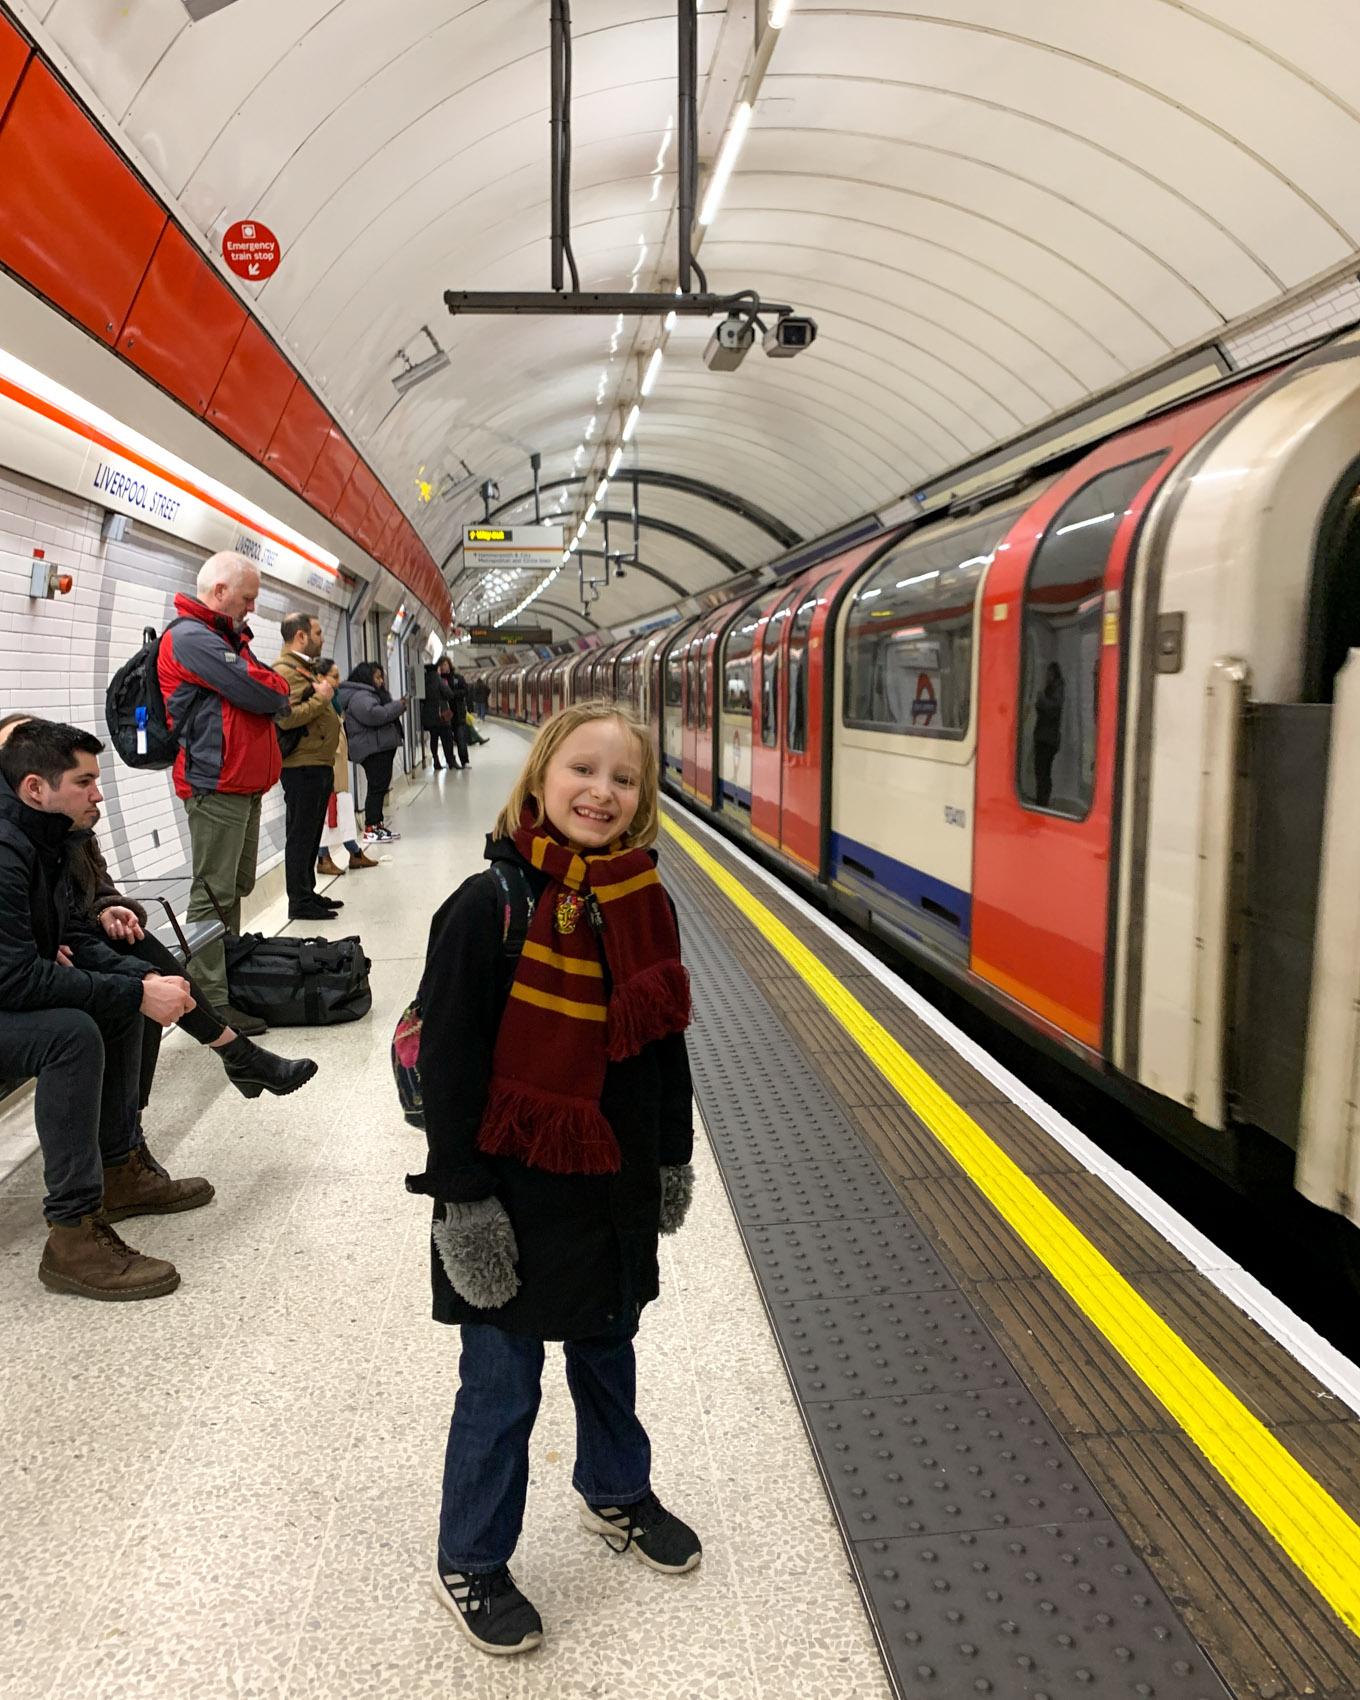 Lontoo - London Tube